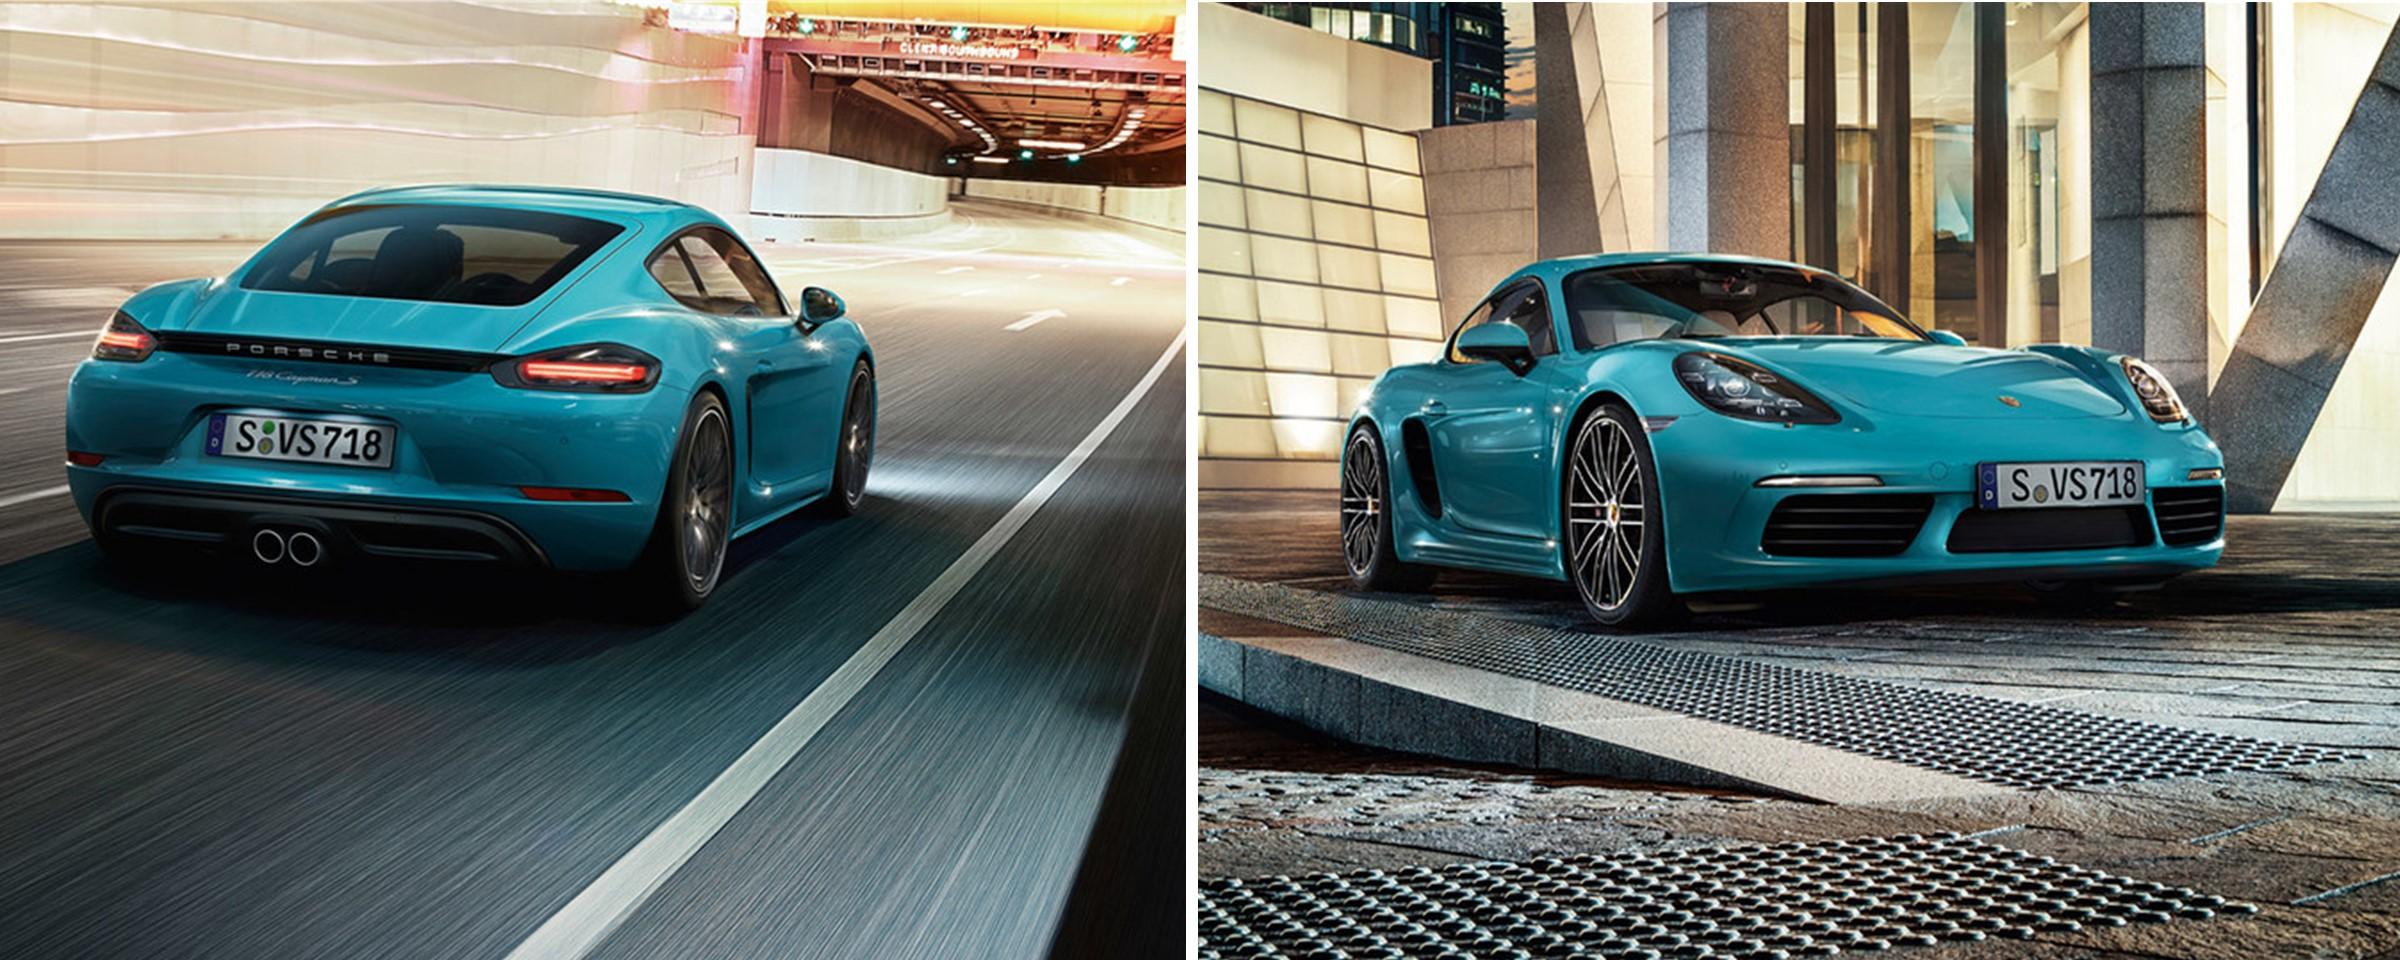 Porsche st louis staff st louis porsche dealer in st for Mercedes benz dealers in st louis area